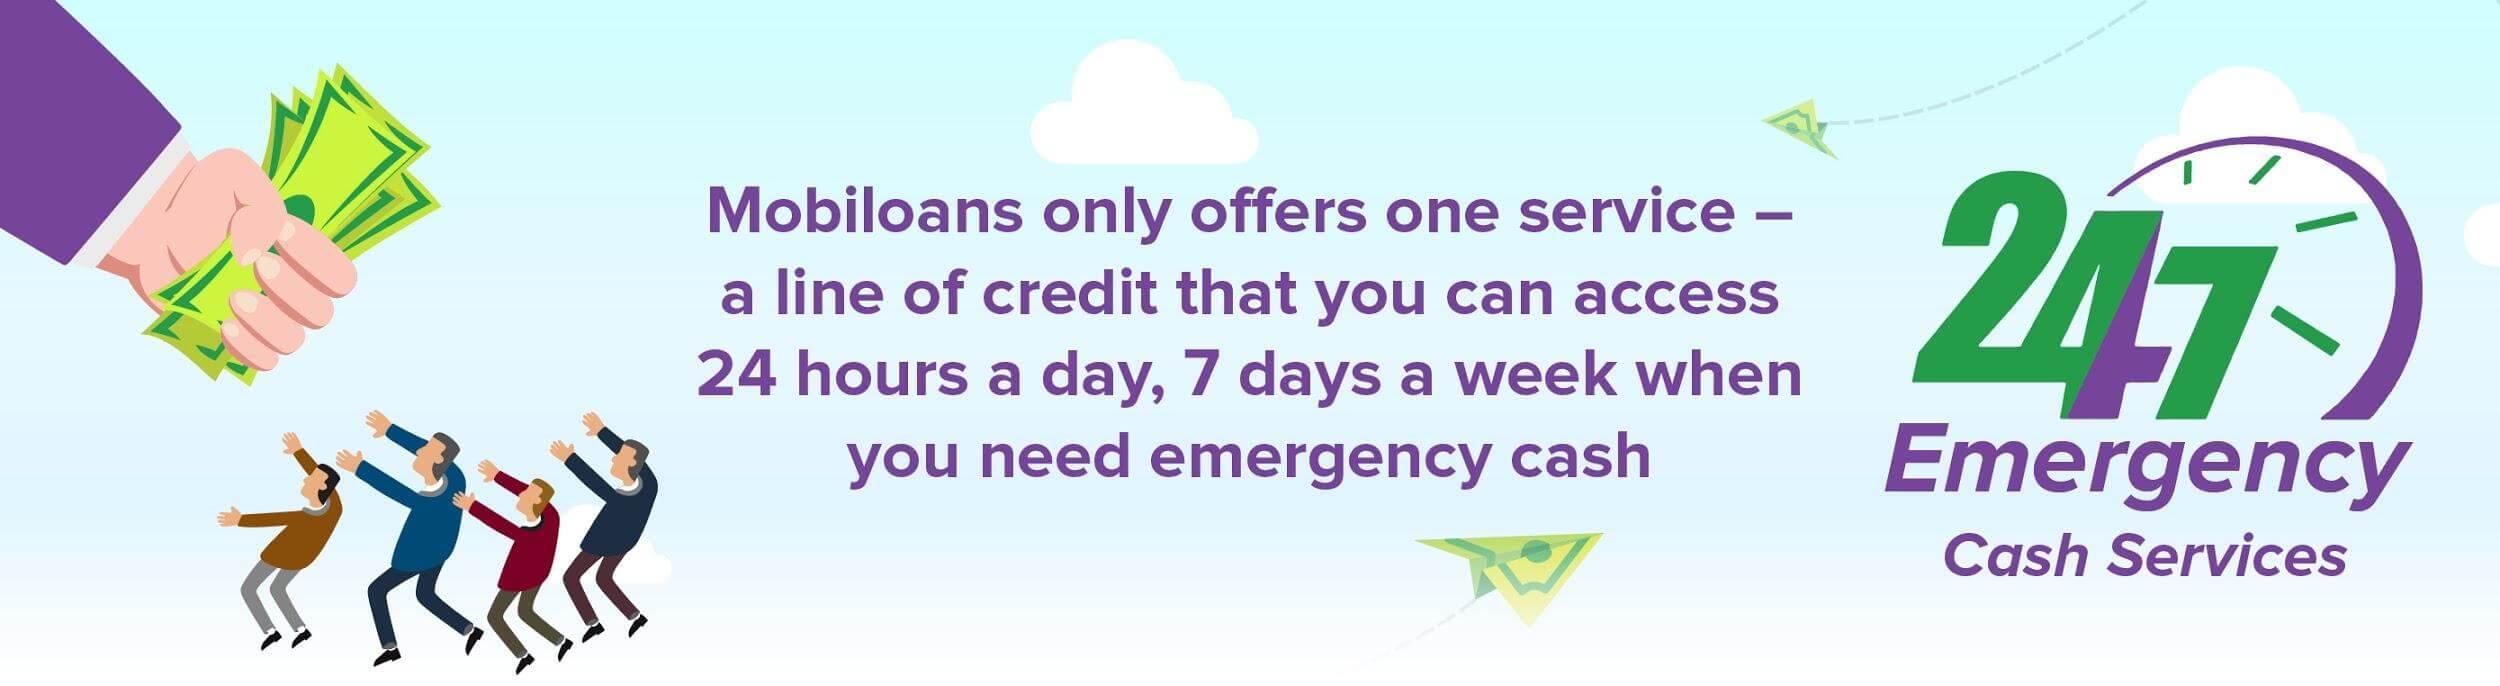 Payday advance of america image 4